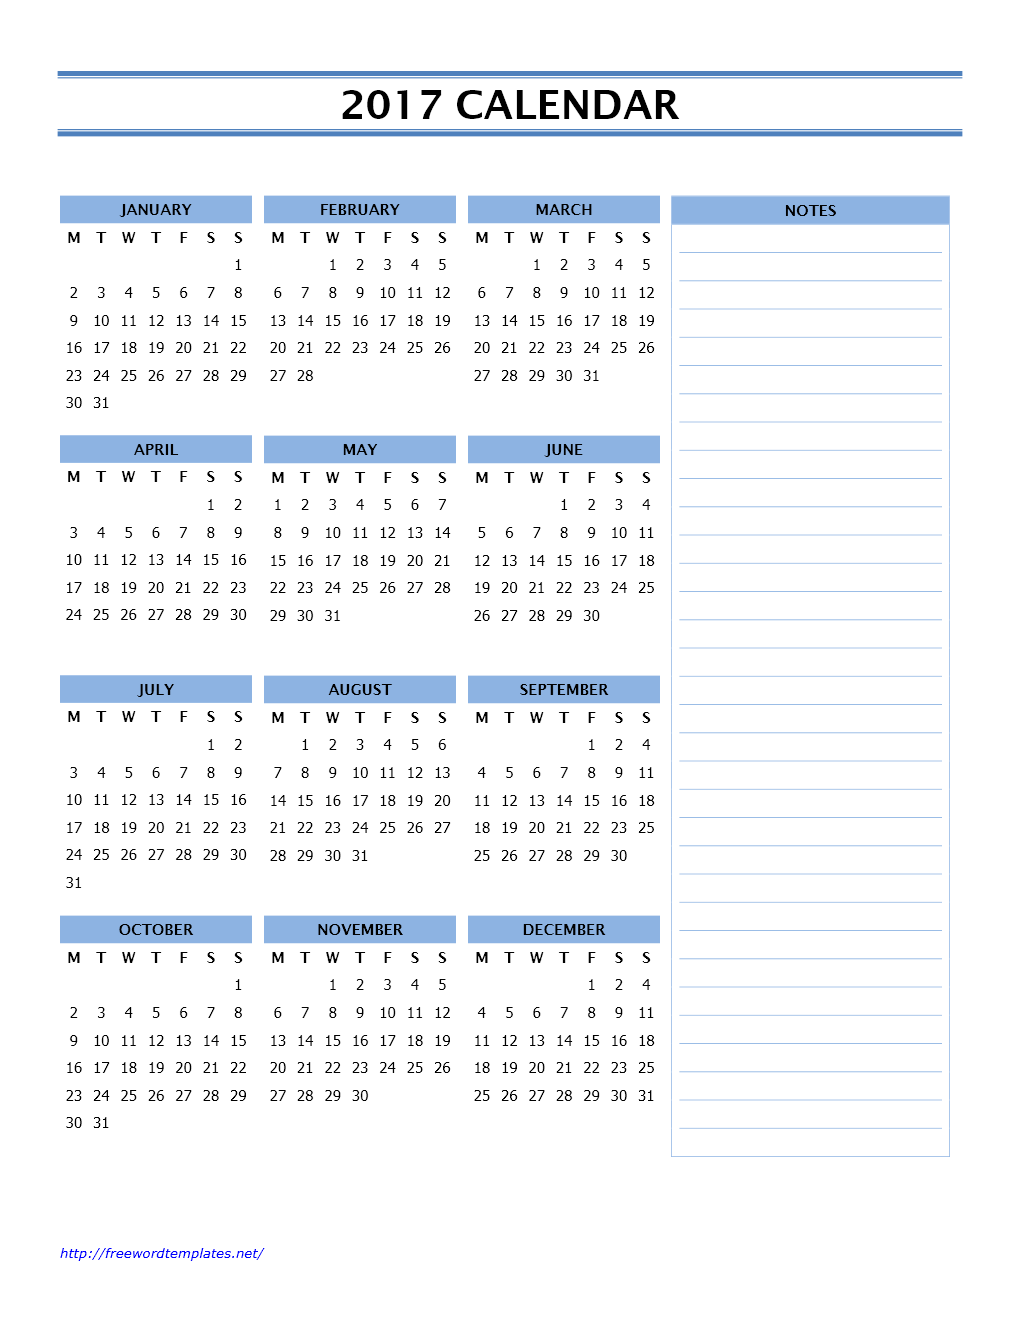 2017 Calendar Templates | Freewordtemplates.net